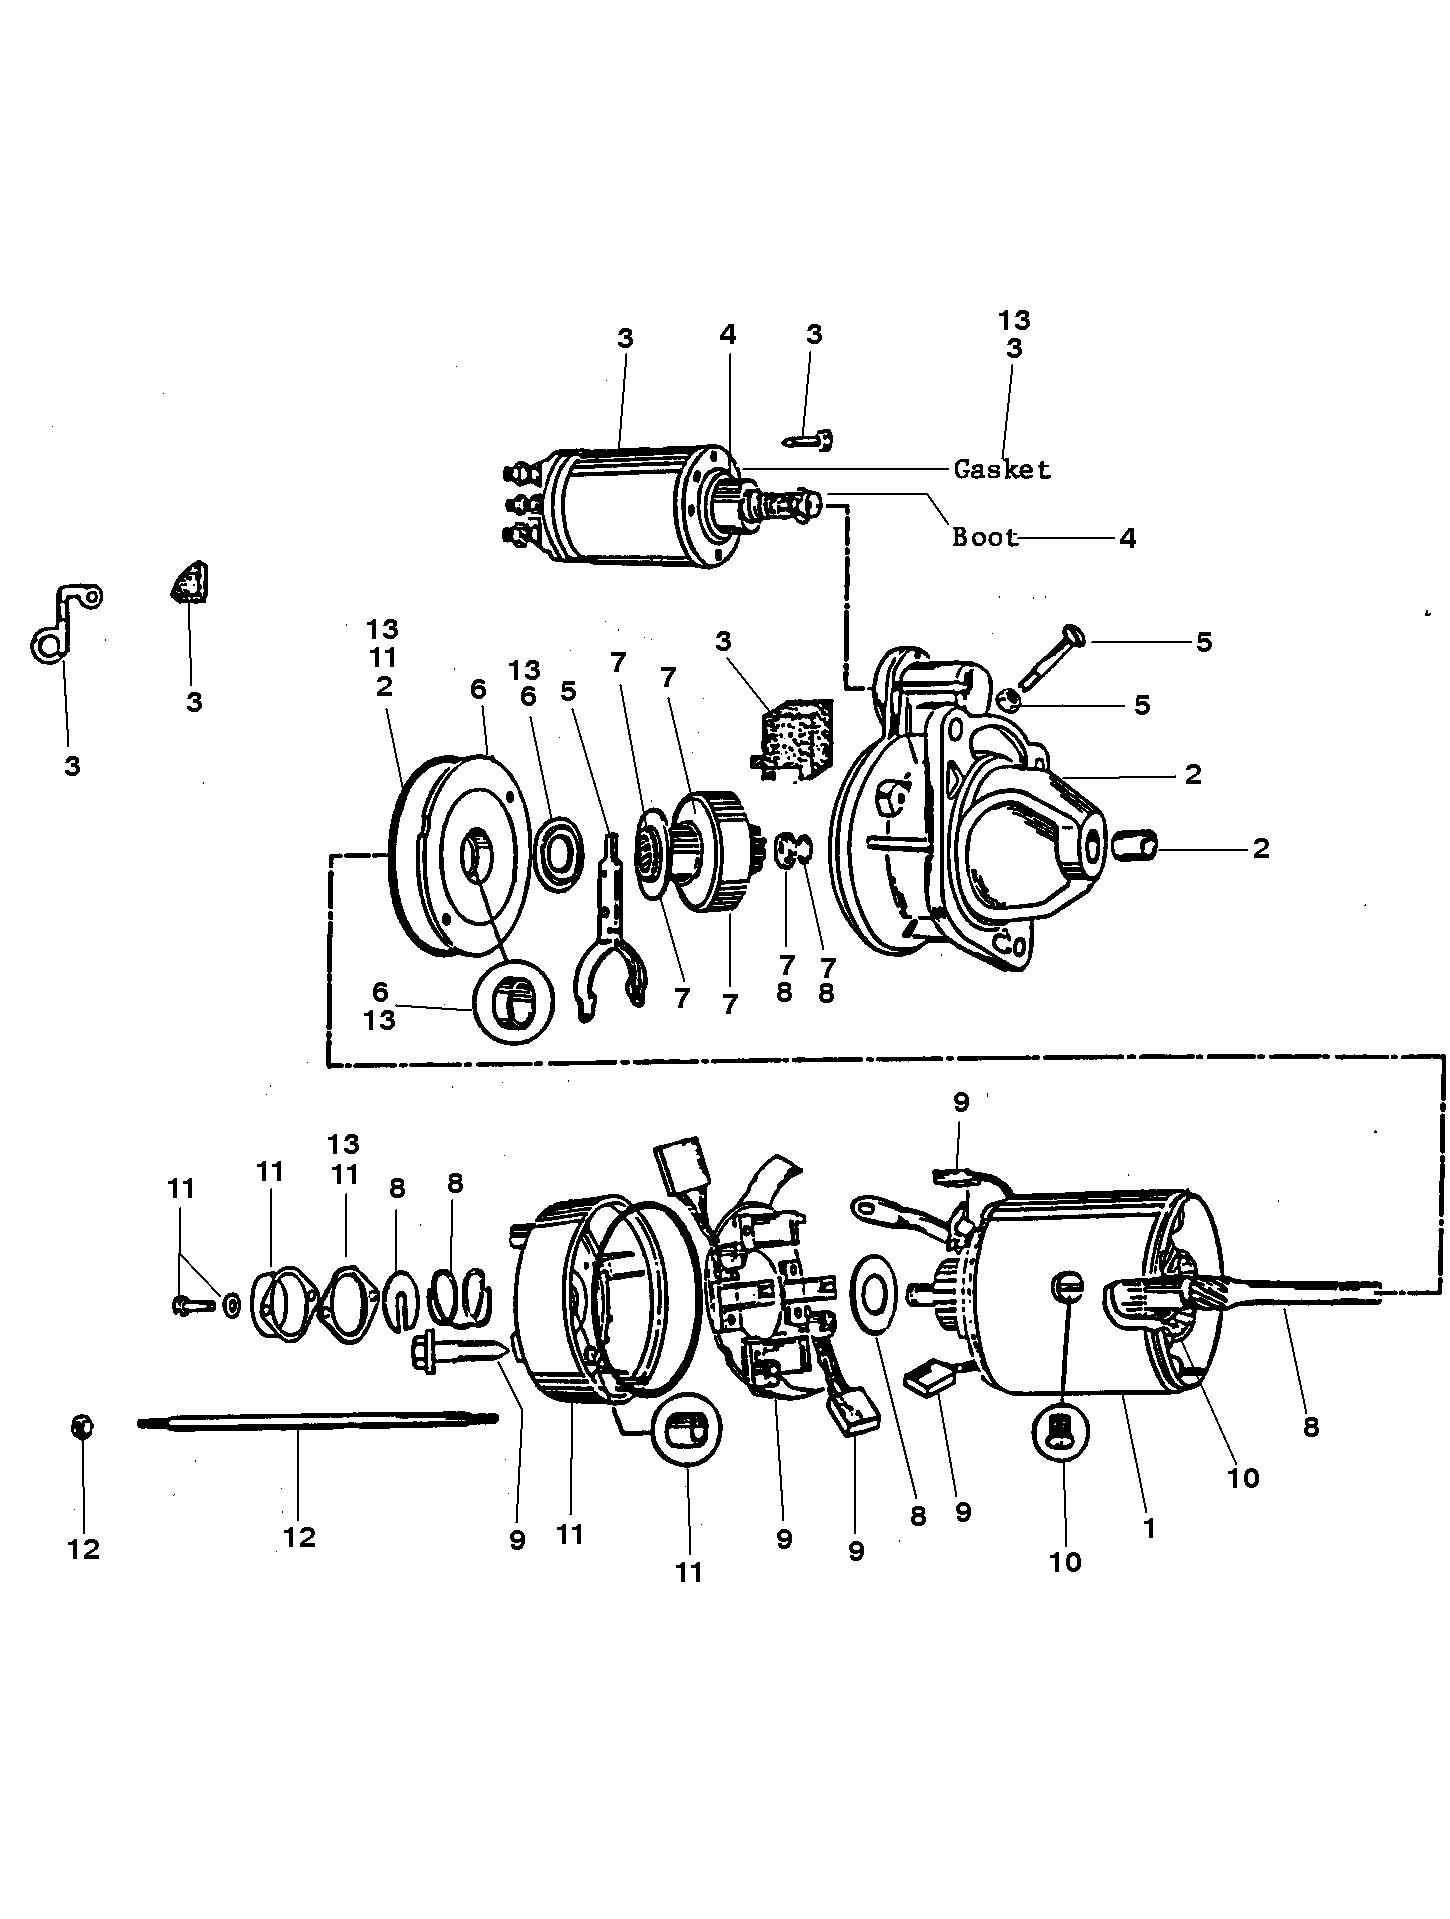 Boat Starter Diagram 454 | Wiring Diagram on mercruiser 5.0 mpi diagram, mopar neutral safety switch wiring diagram, mercruiser schematic diagram, mercruiser wiring harness diagram, mercruiser distributor diagram, auto on off switch diagram, 898 mercruiser v8 305 diagram, mercruiser engine wiring diagram, mercruiser 3.0 trim diagram, mercruiser 5.0 engine diagram, mercruiser 470 wiring-diagram, mercruiser 5.0 cooling system diagram, mercruiser throttle assembly diagram, mercruiser 5.7 wiring-diagram, mercruiser 350 wiring diagram, mopar ballast resistor wiring diagram, mercruiser generator wiring diagram, mercruiser 5.0 wiring-diagram, mercruiser shift interrupter switch wiring diagram, mercruiser wiring schematic,